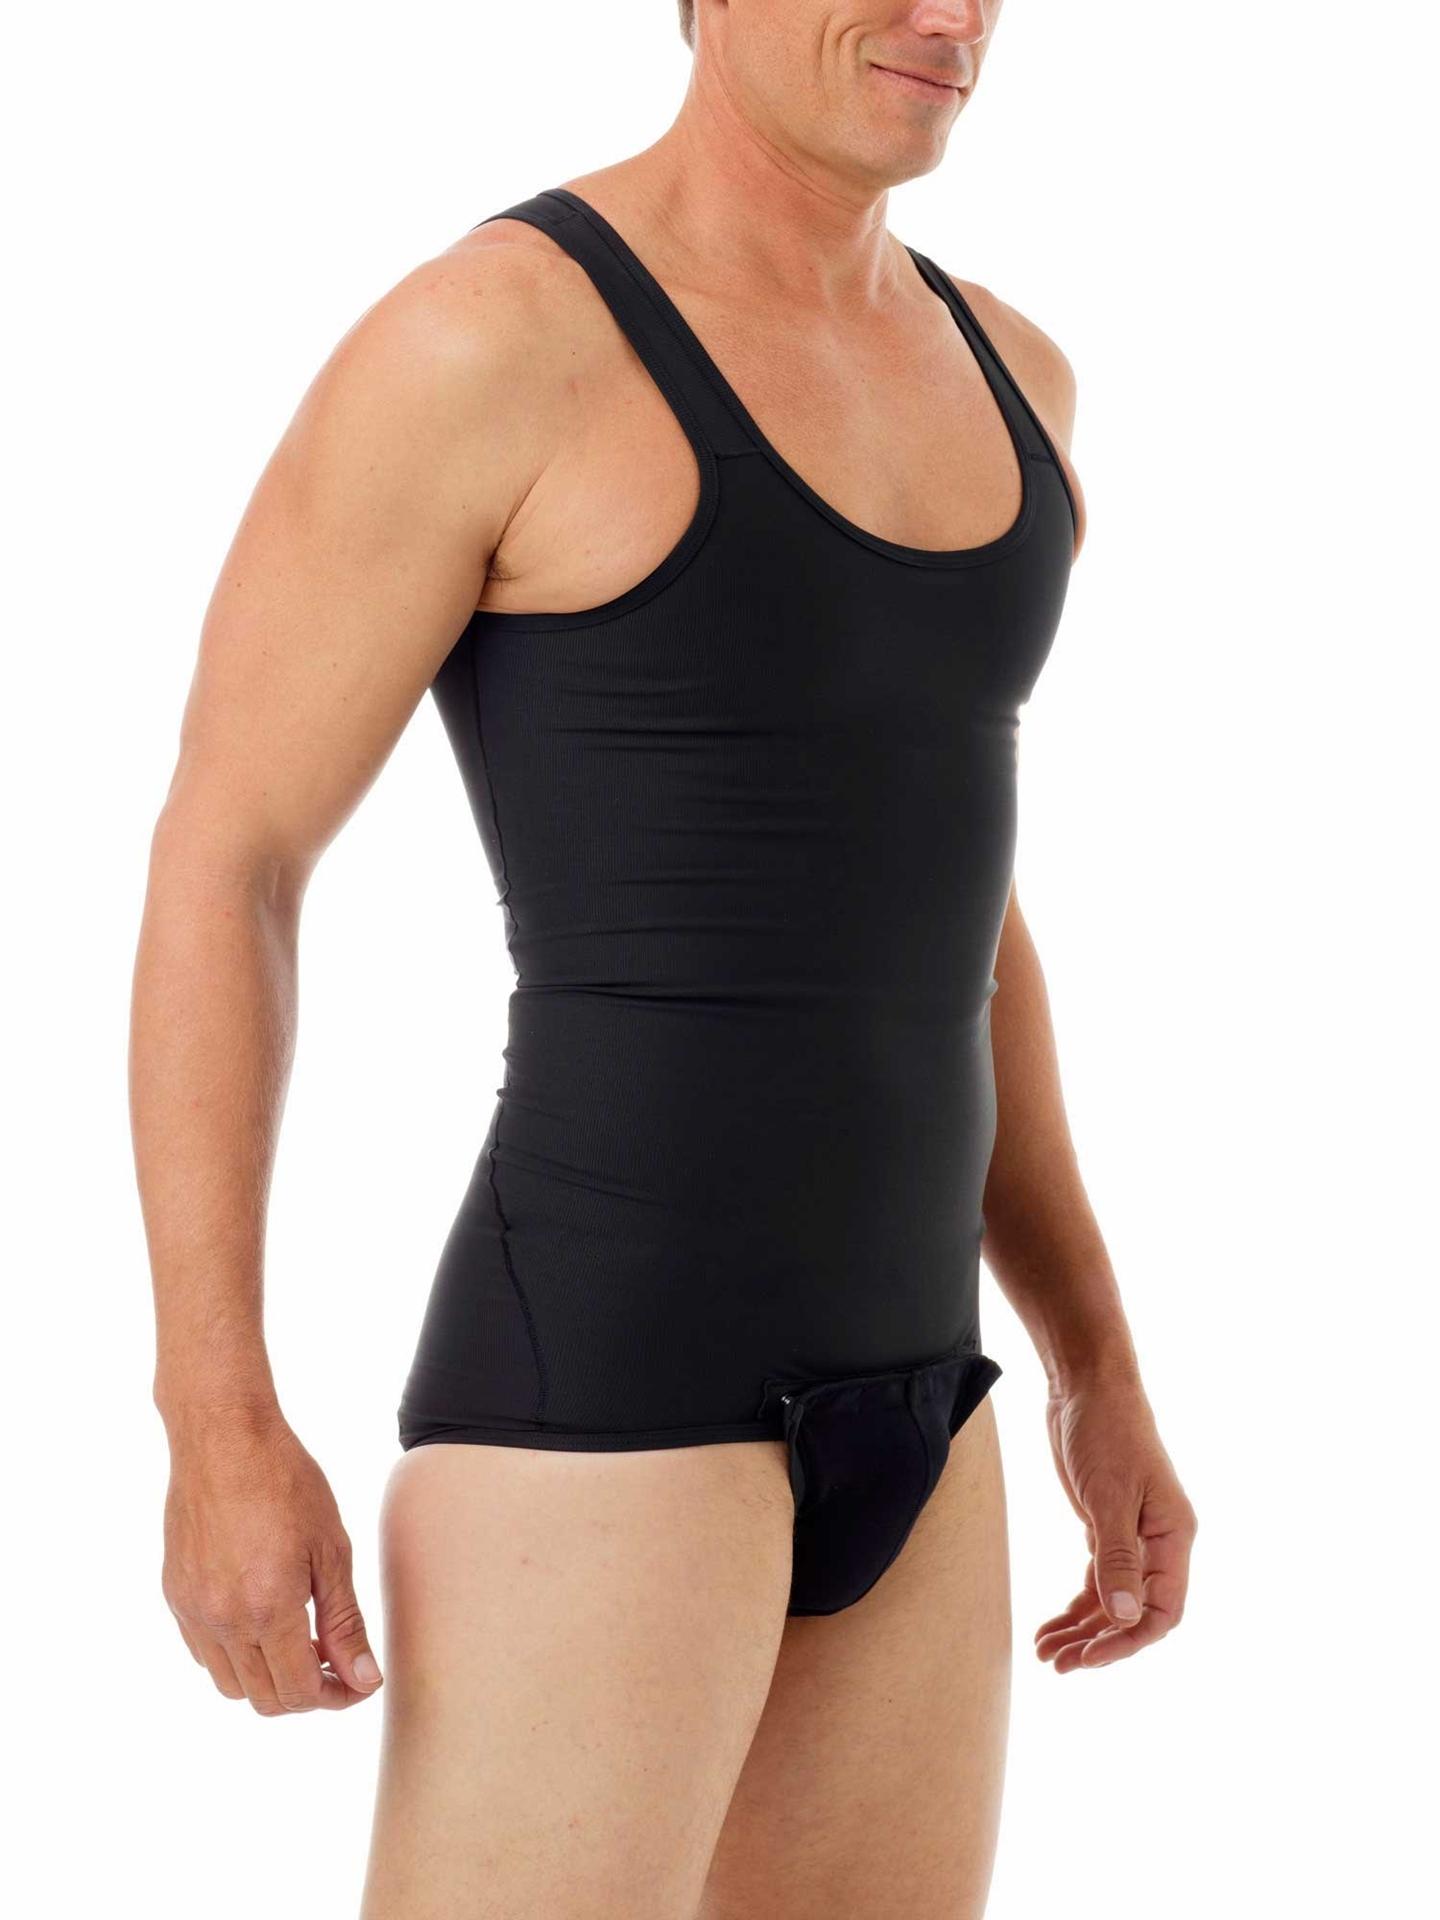 Black Shapewear Shaping Compression Tanksuit for men